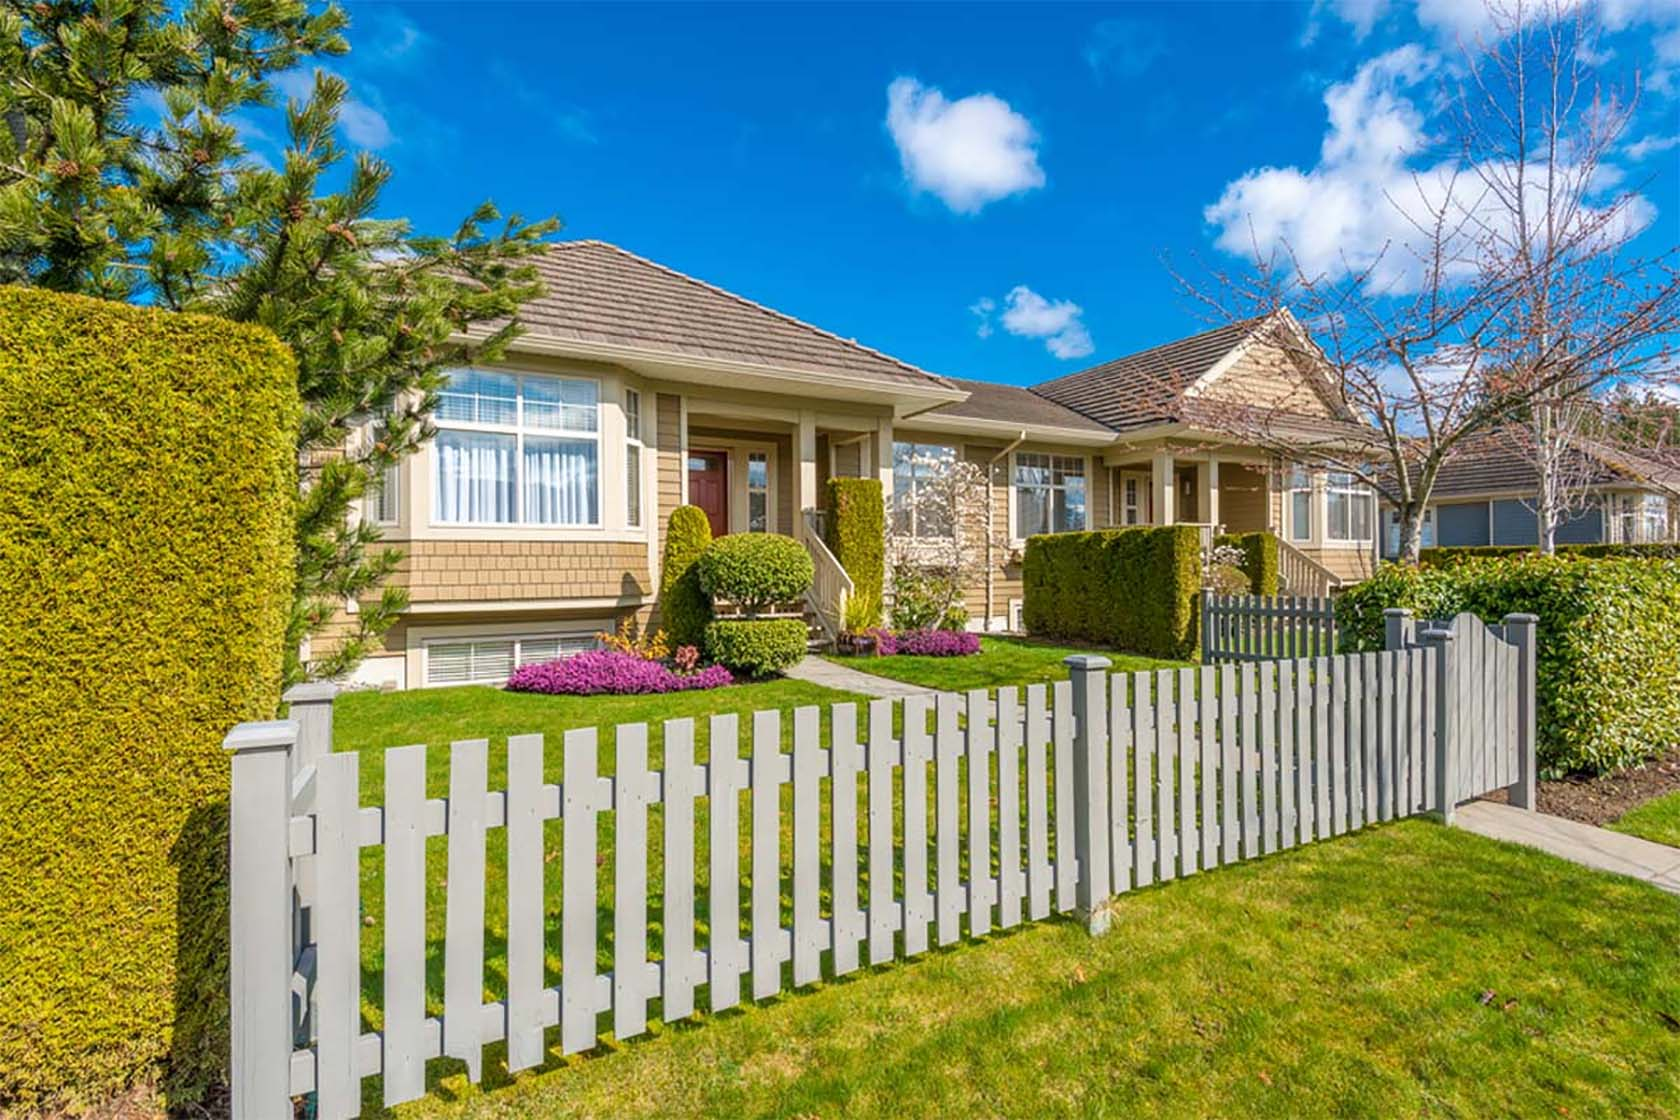 Fence For Huge Backyard